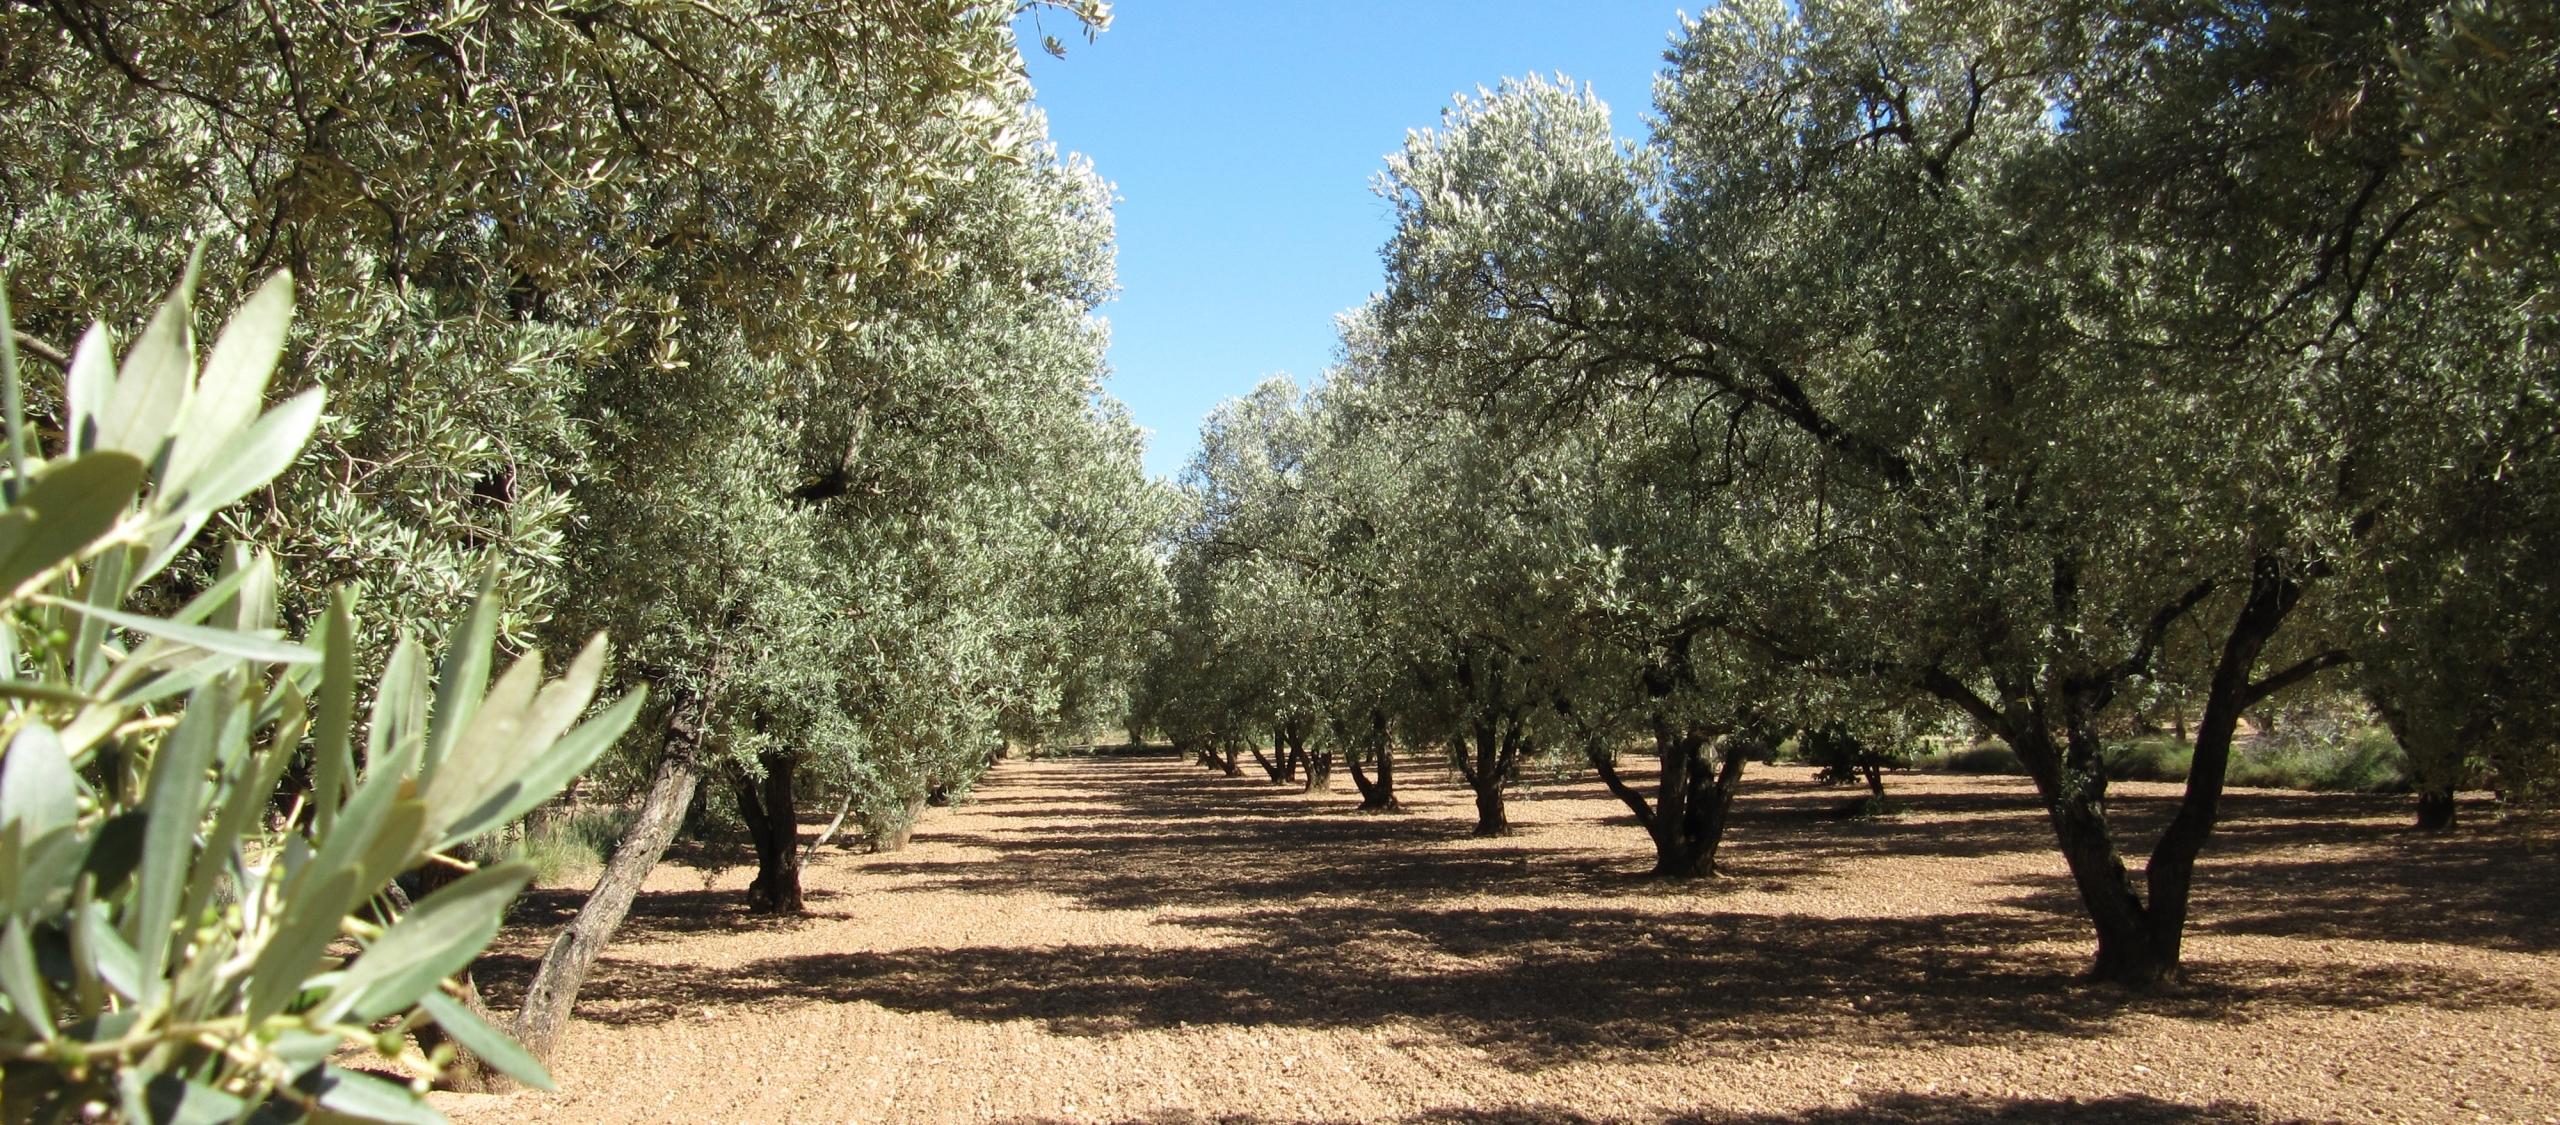 Campo de olivos Belchite, empeltre